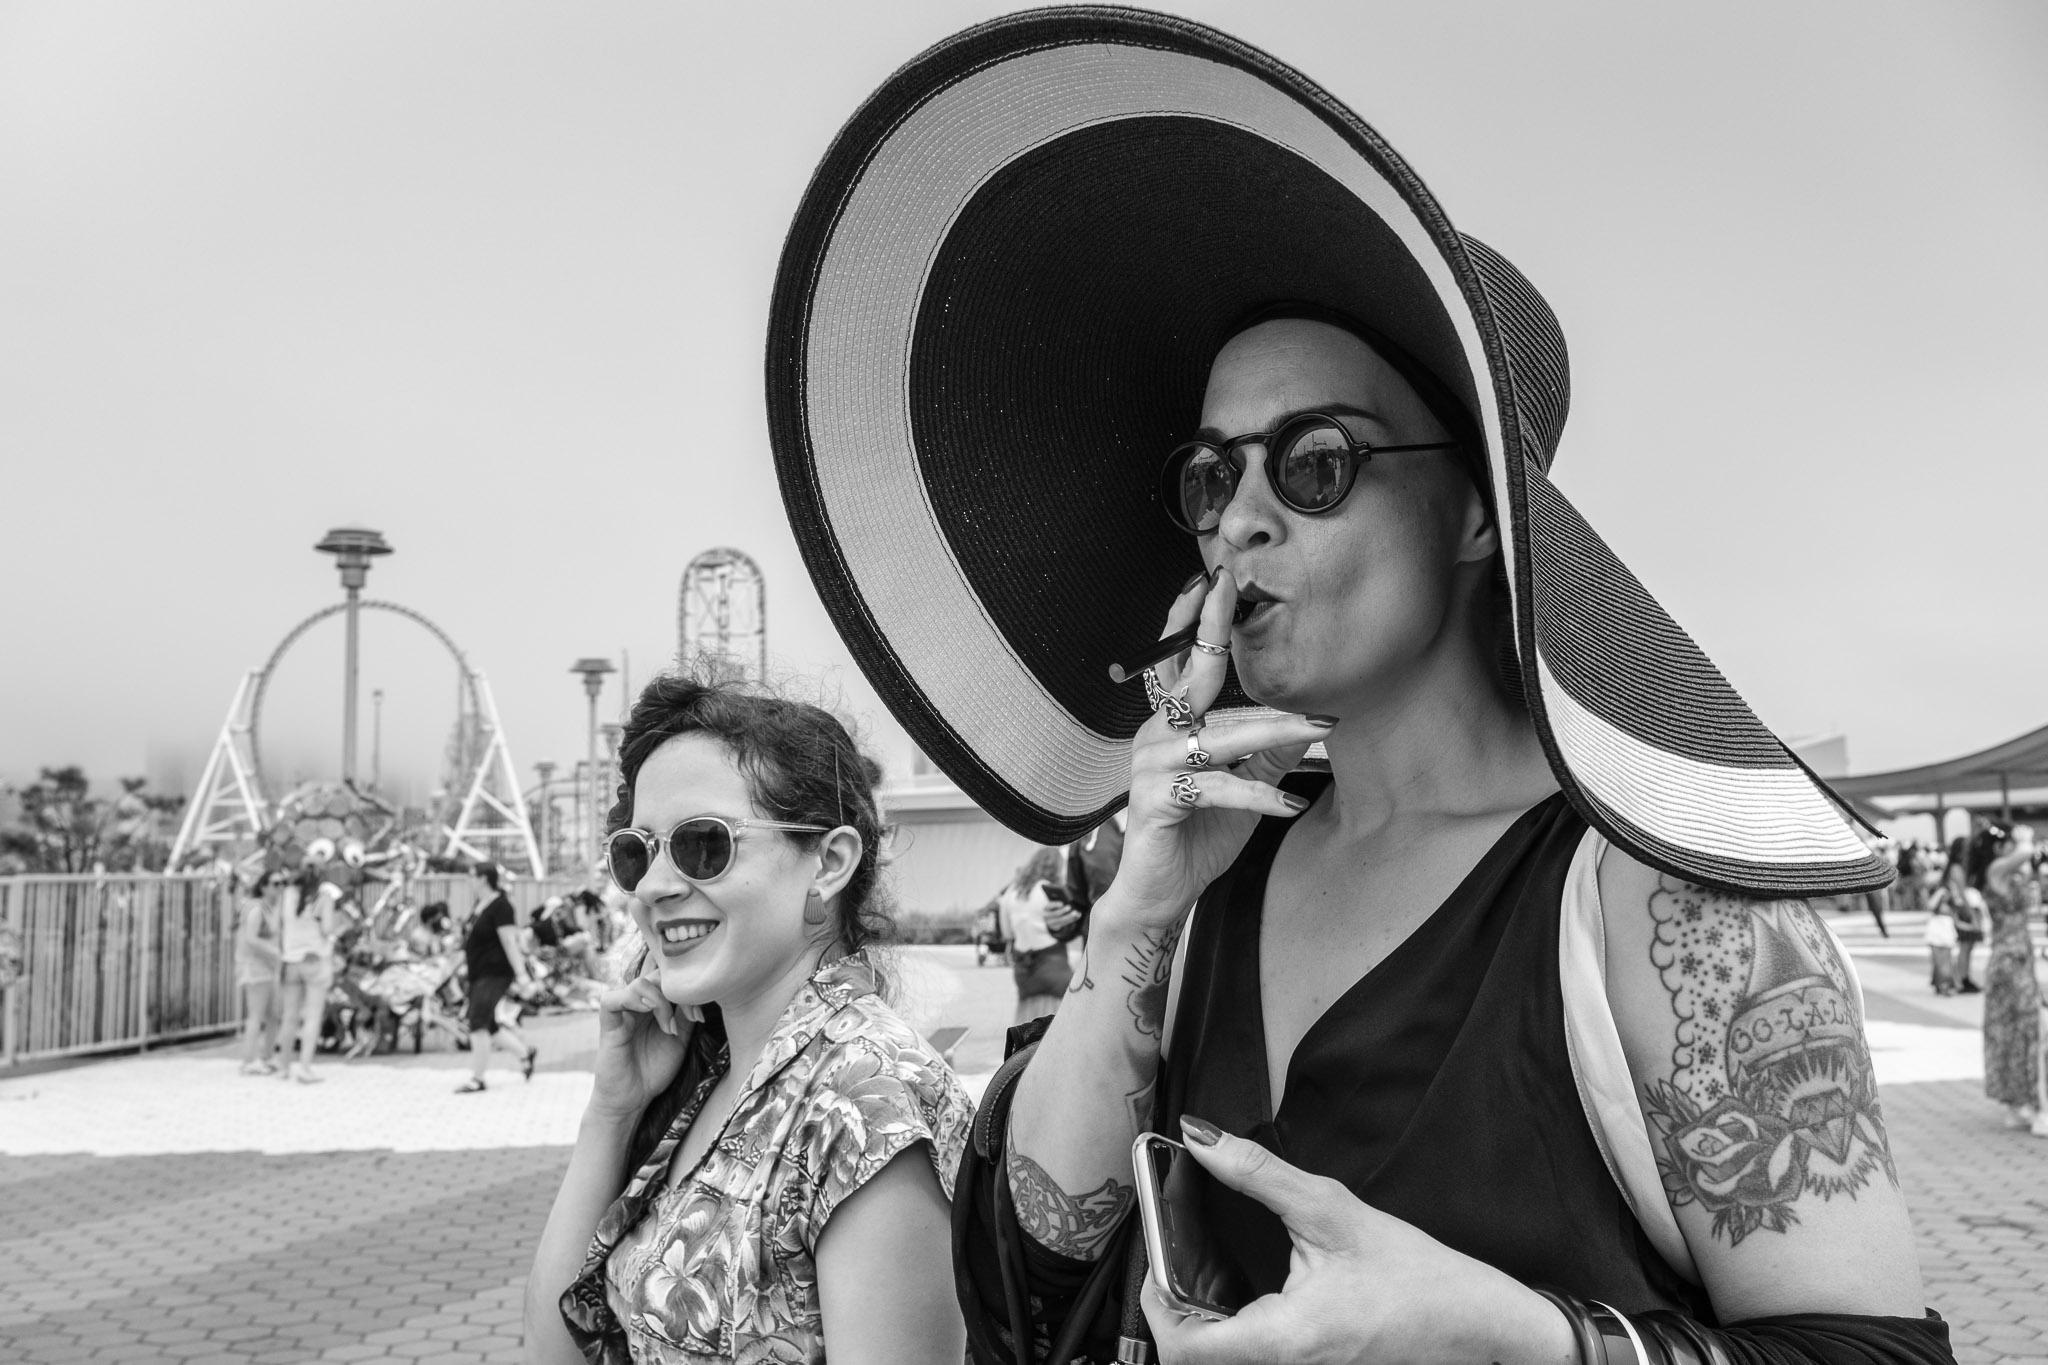 mermaidparade2017_002.jpg